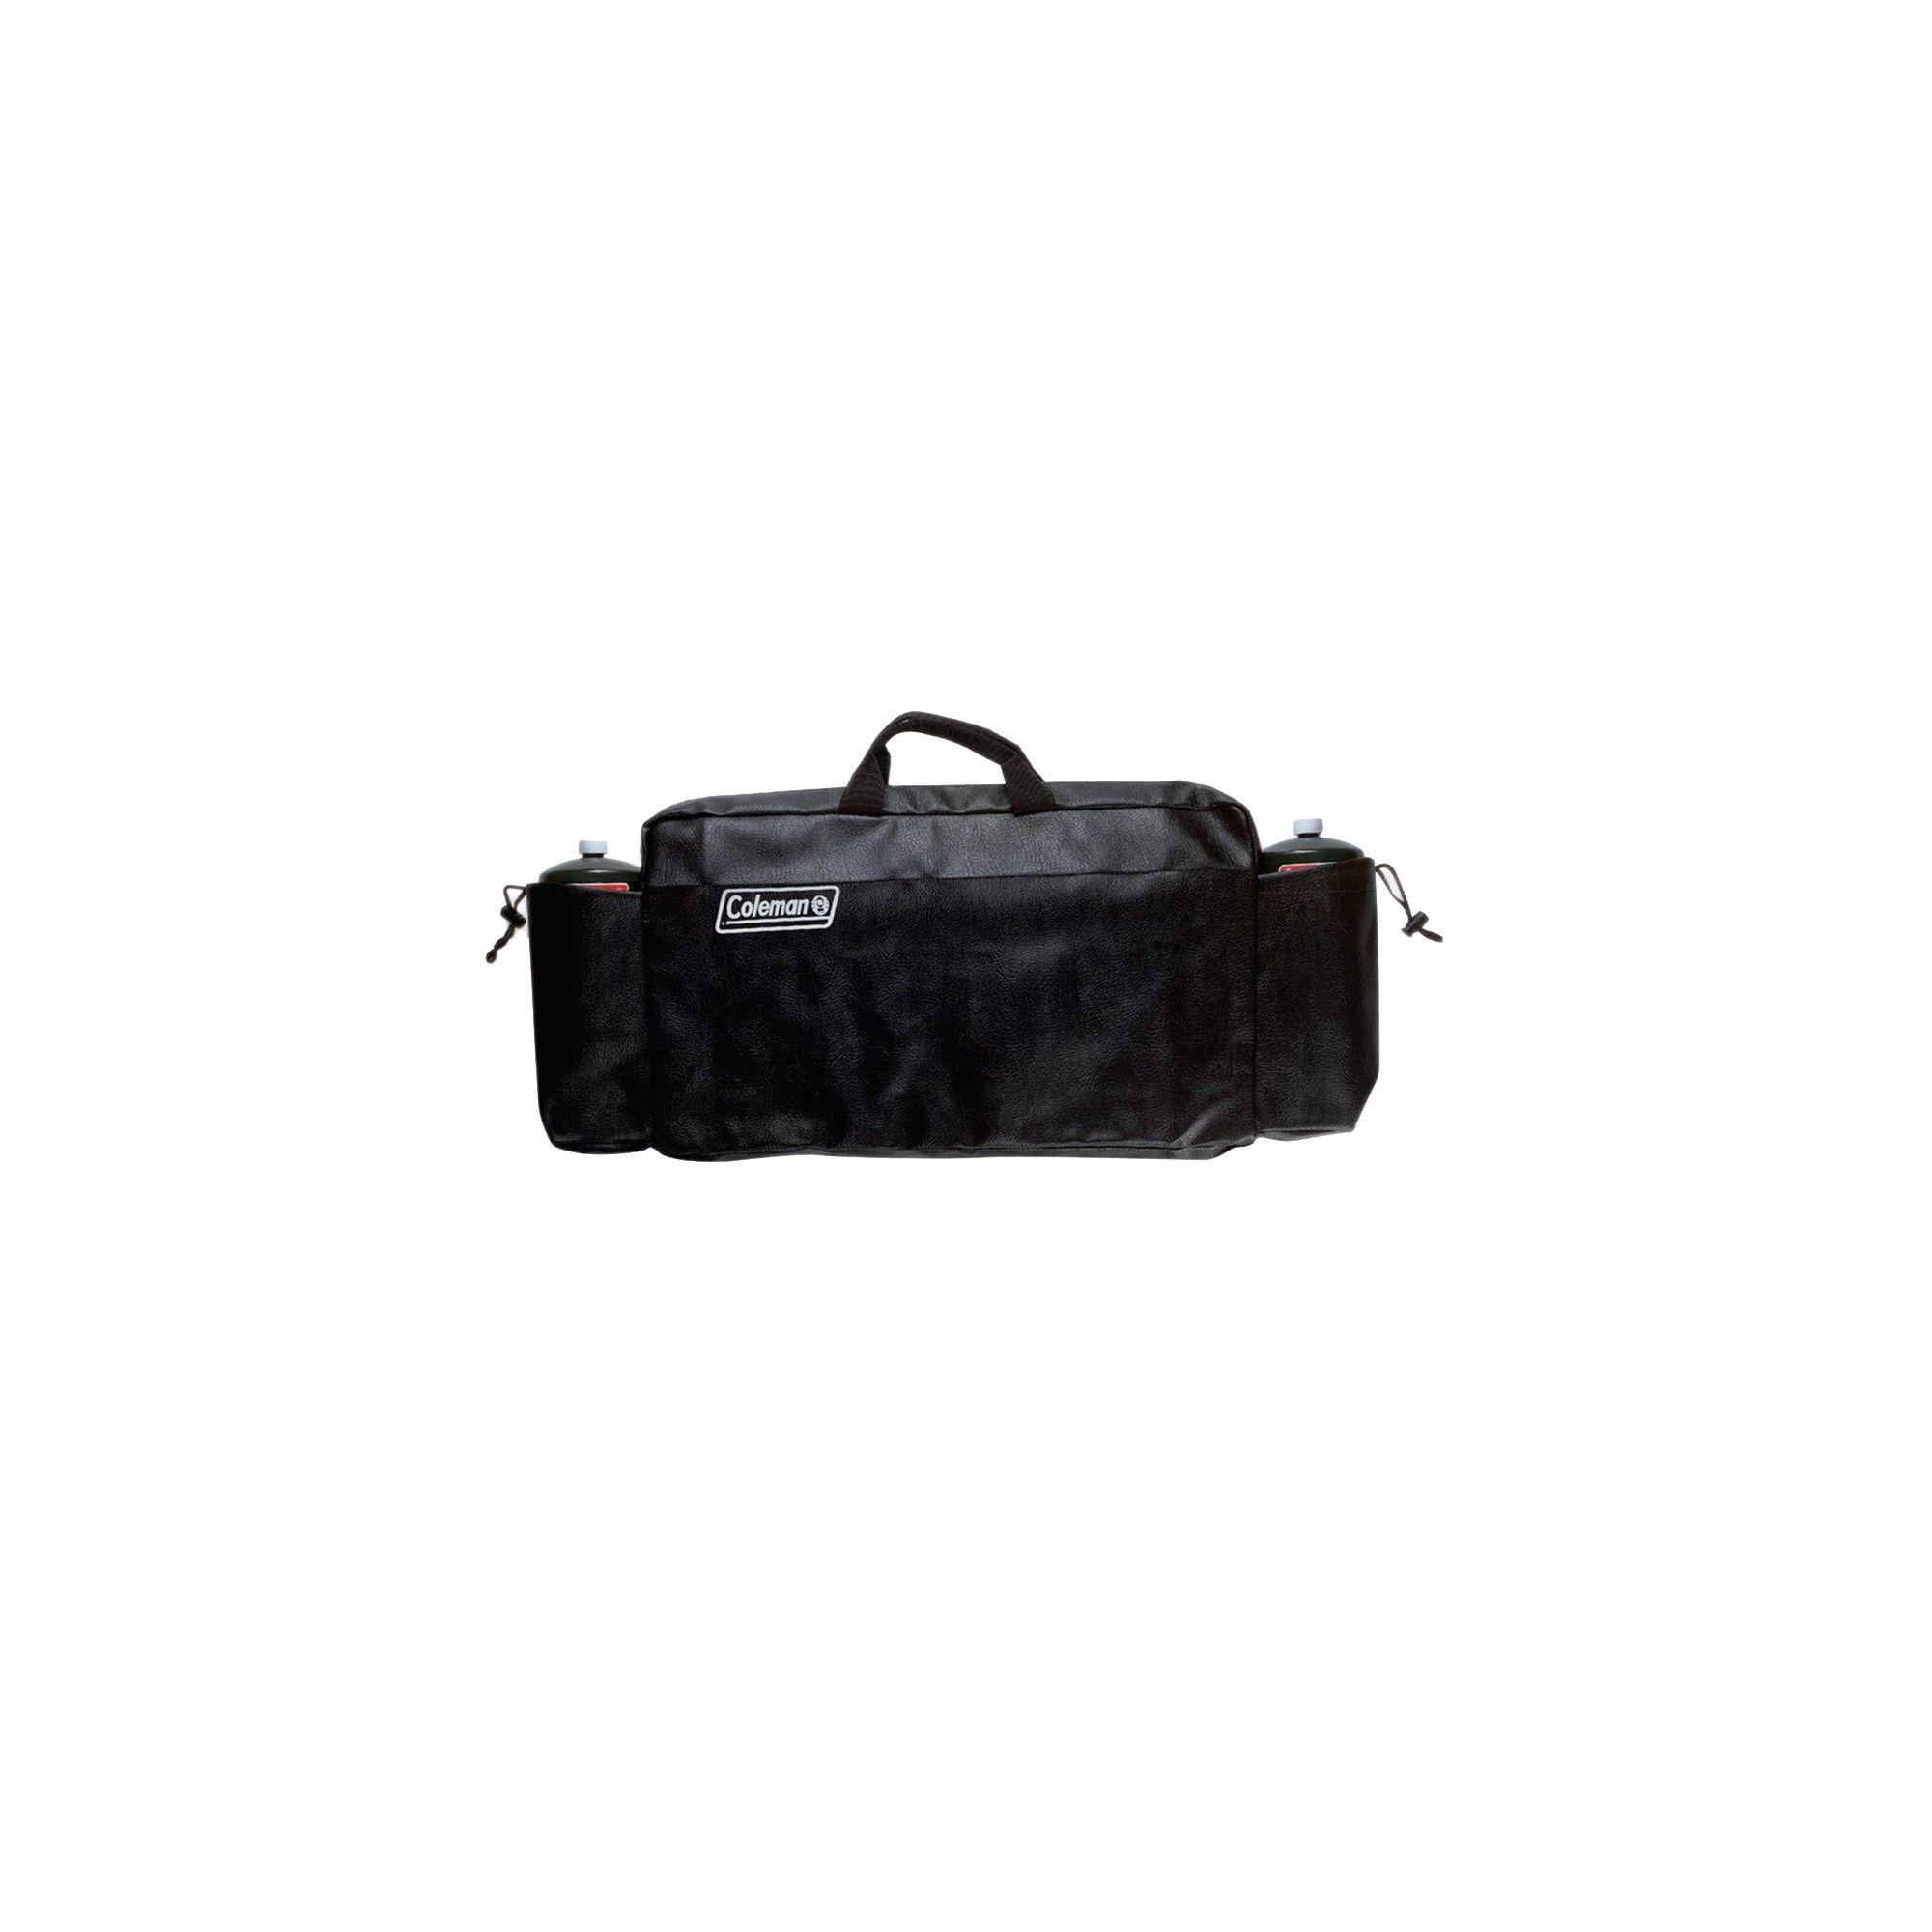 coleman propane stove carry case black coleman propane stove